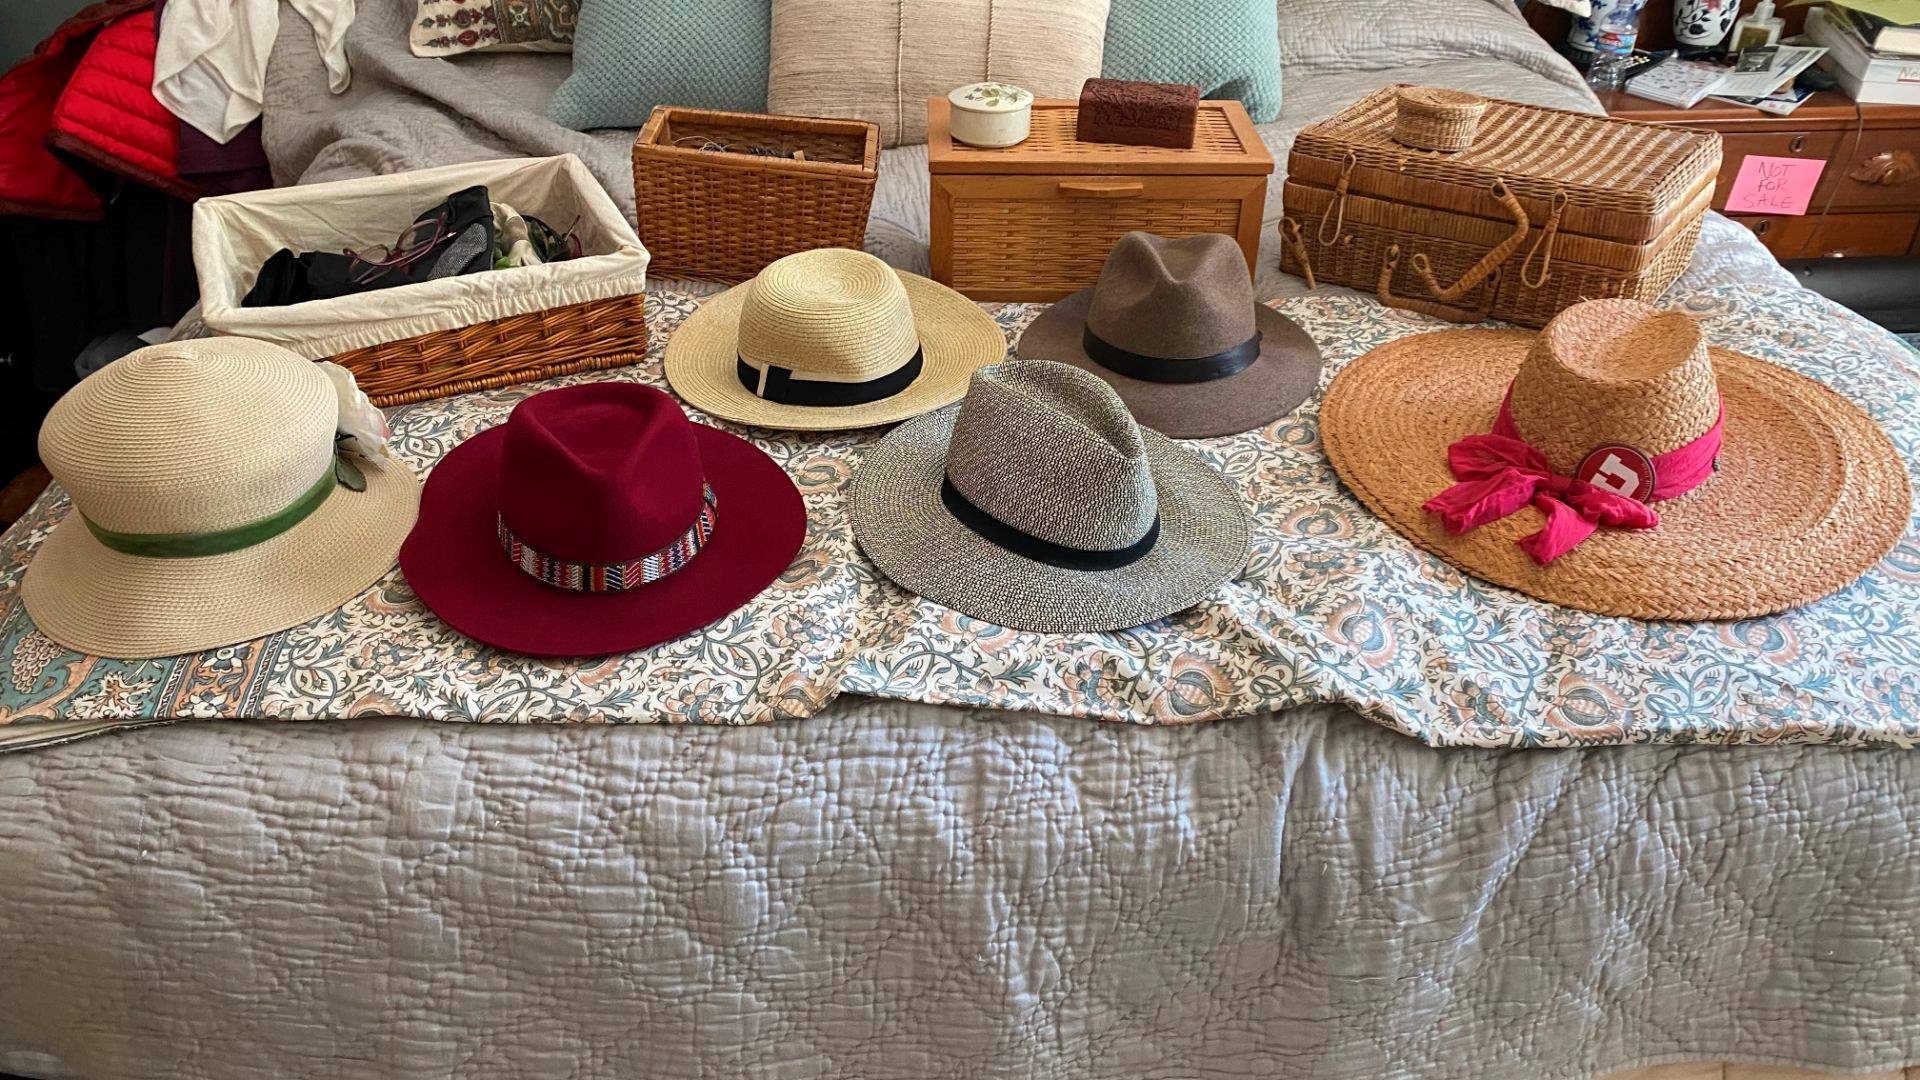 Lot # 178 - Women's Hats, Gloves & Baskets (main image)